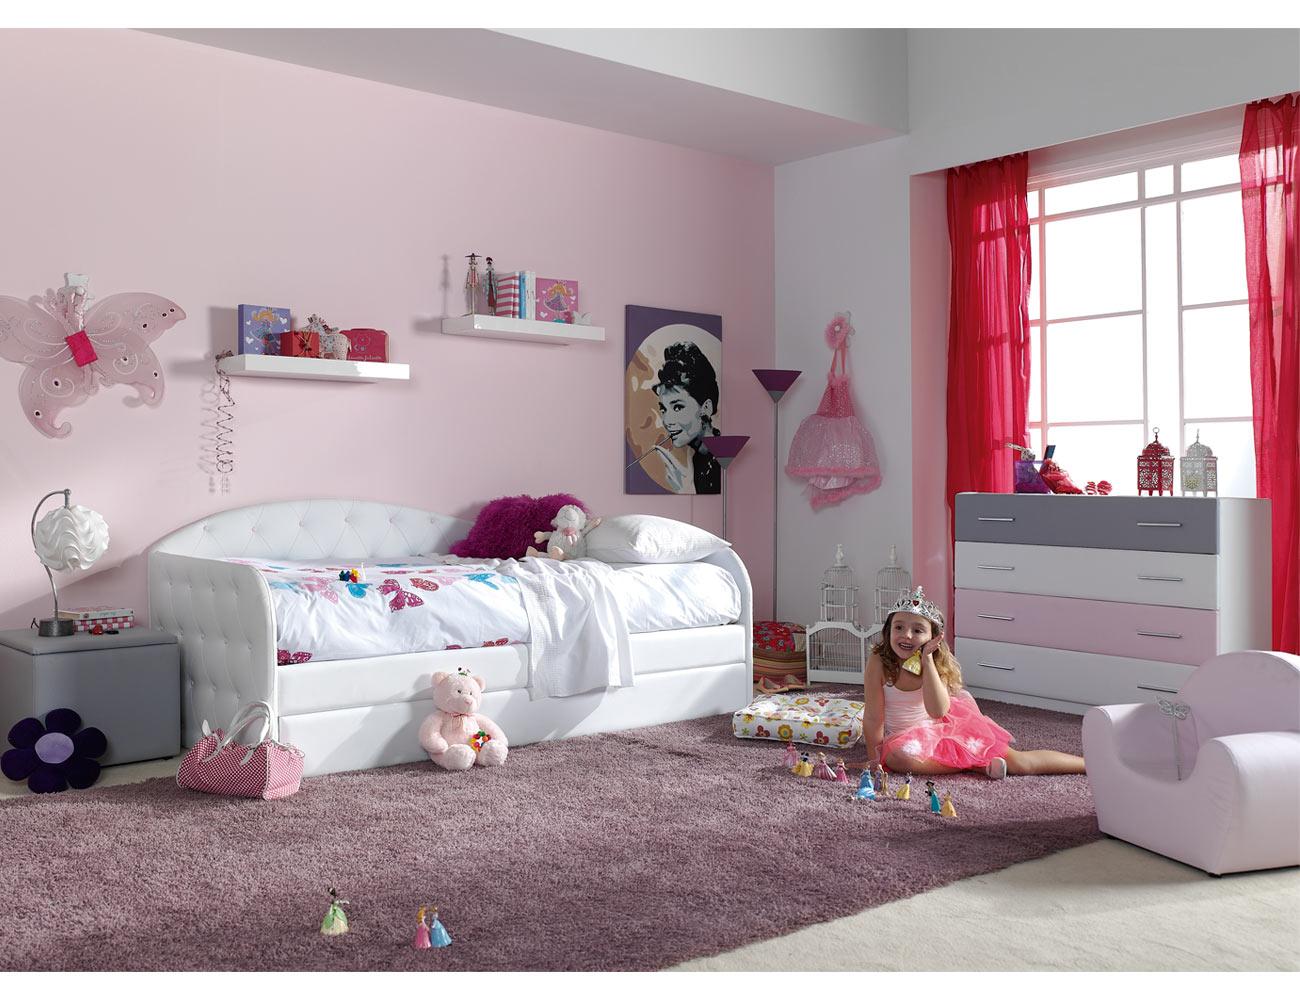 243 cama nido14